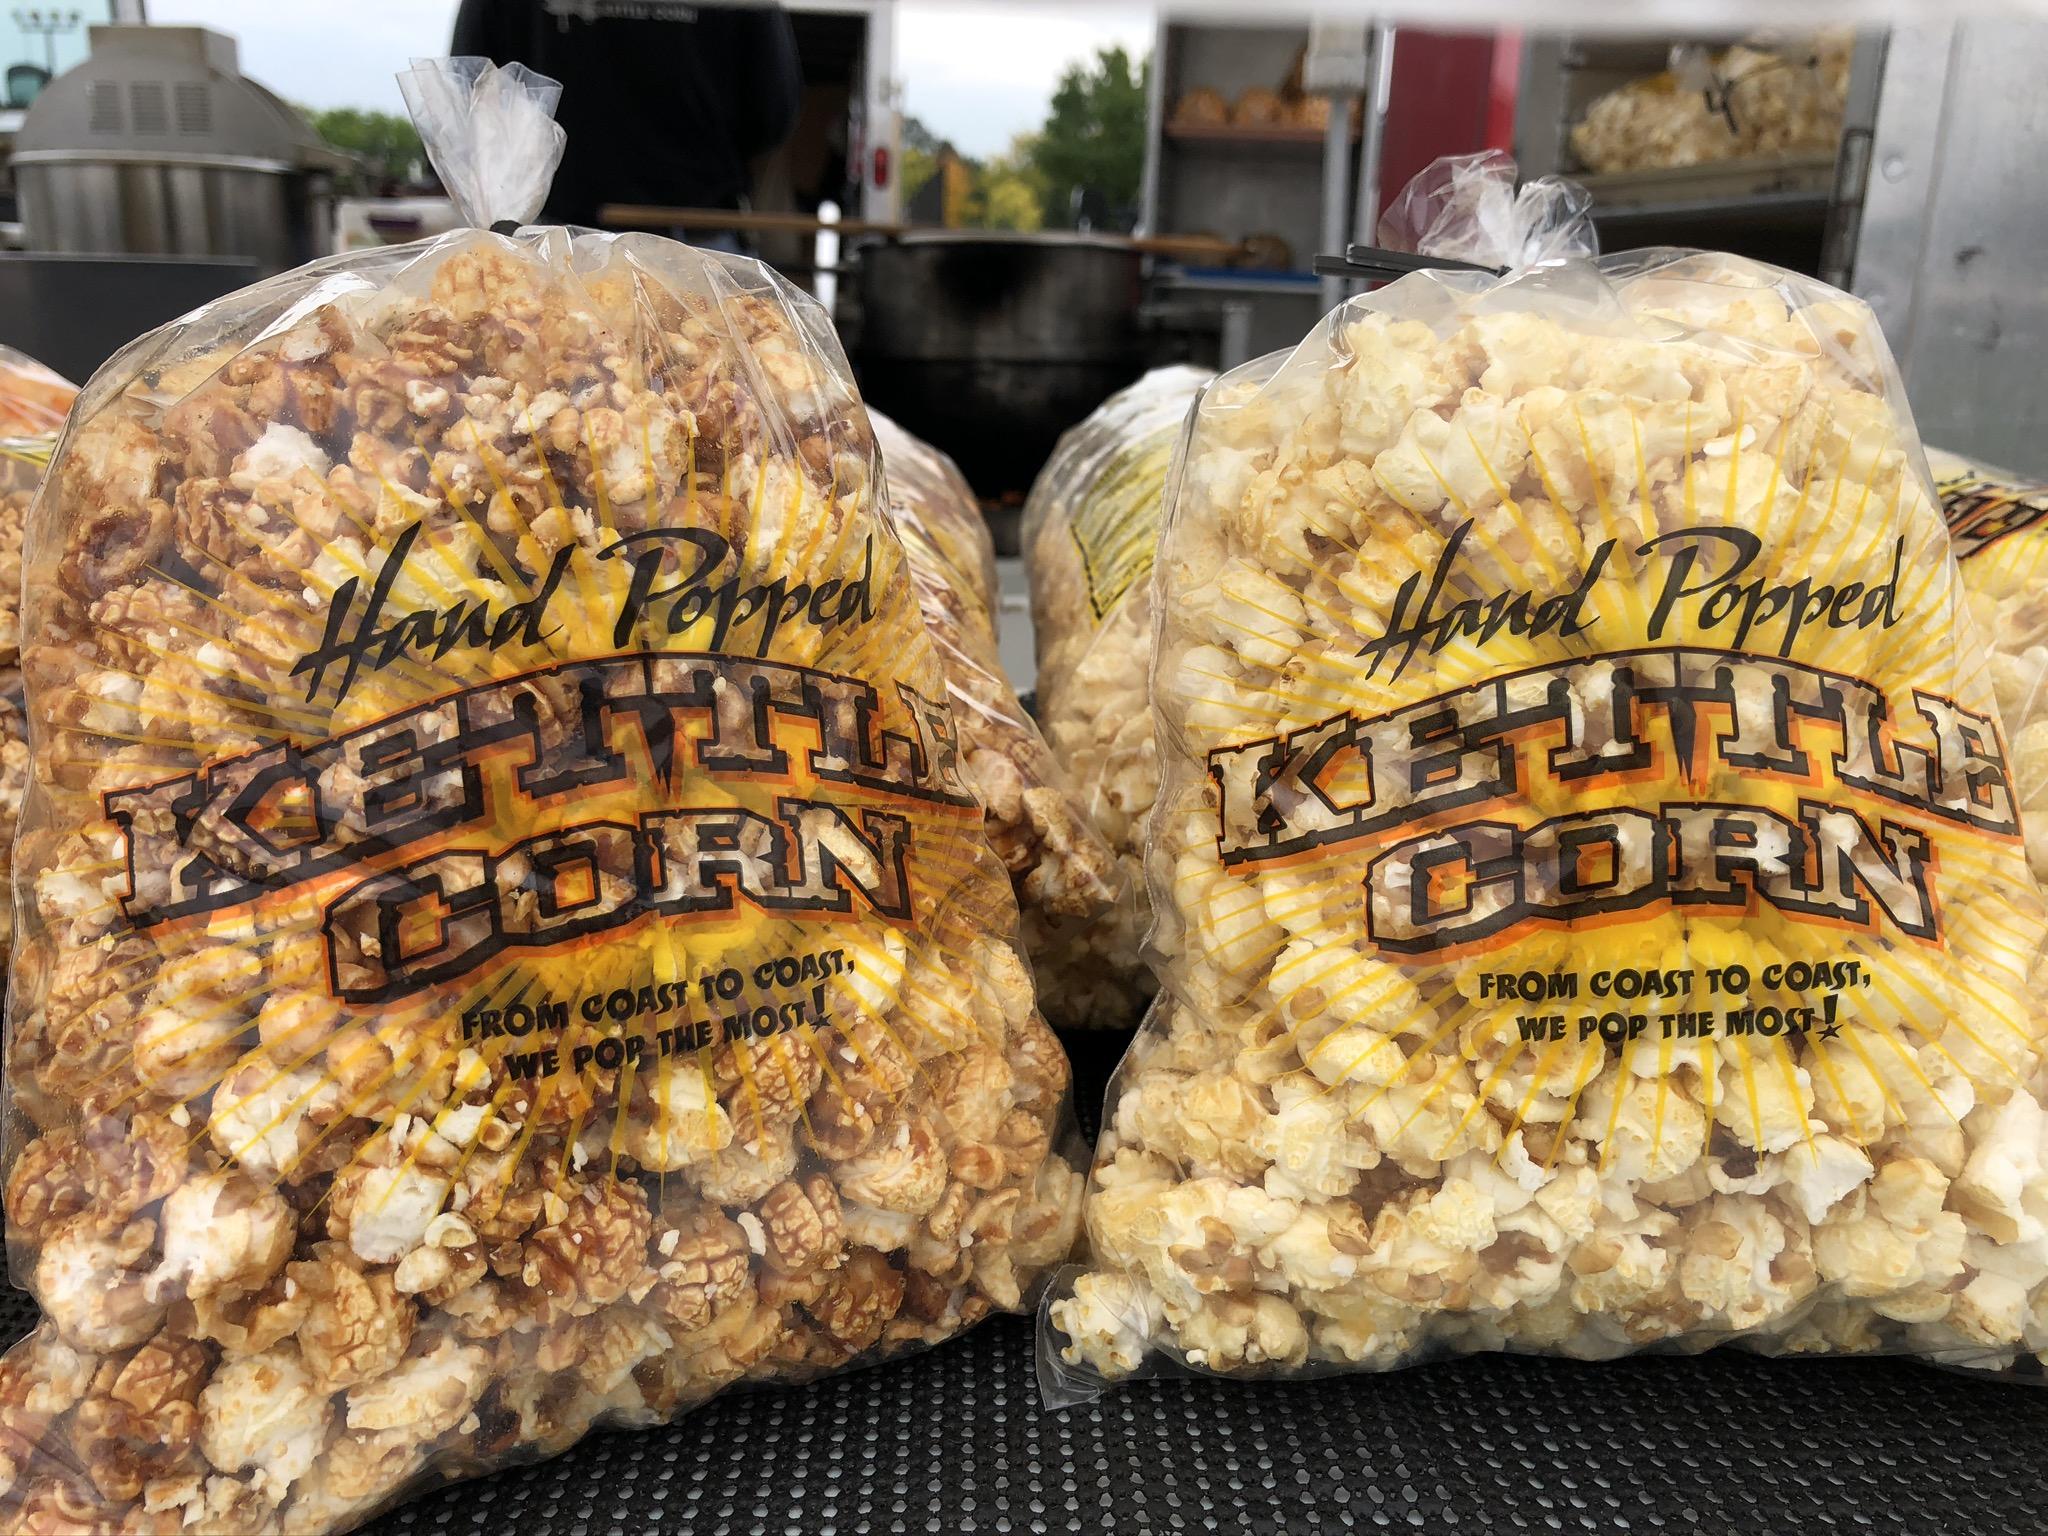 Sky Mountain Kettle Corn